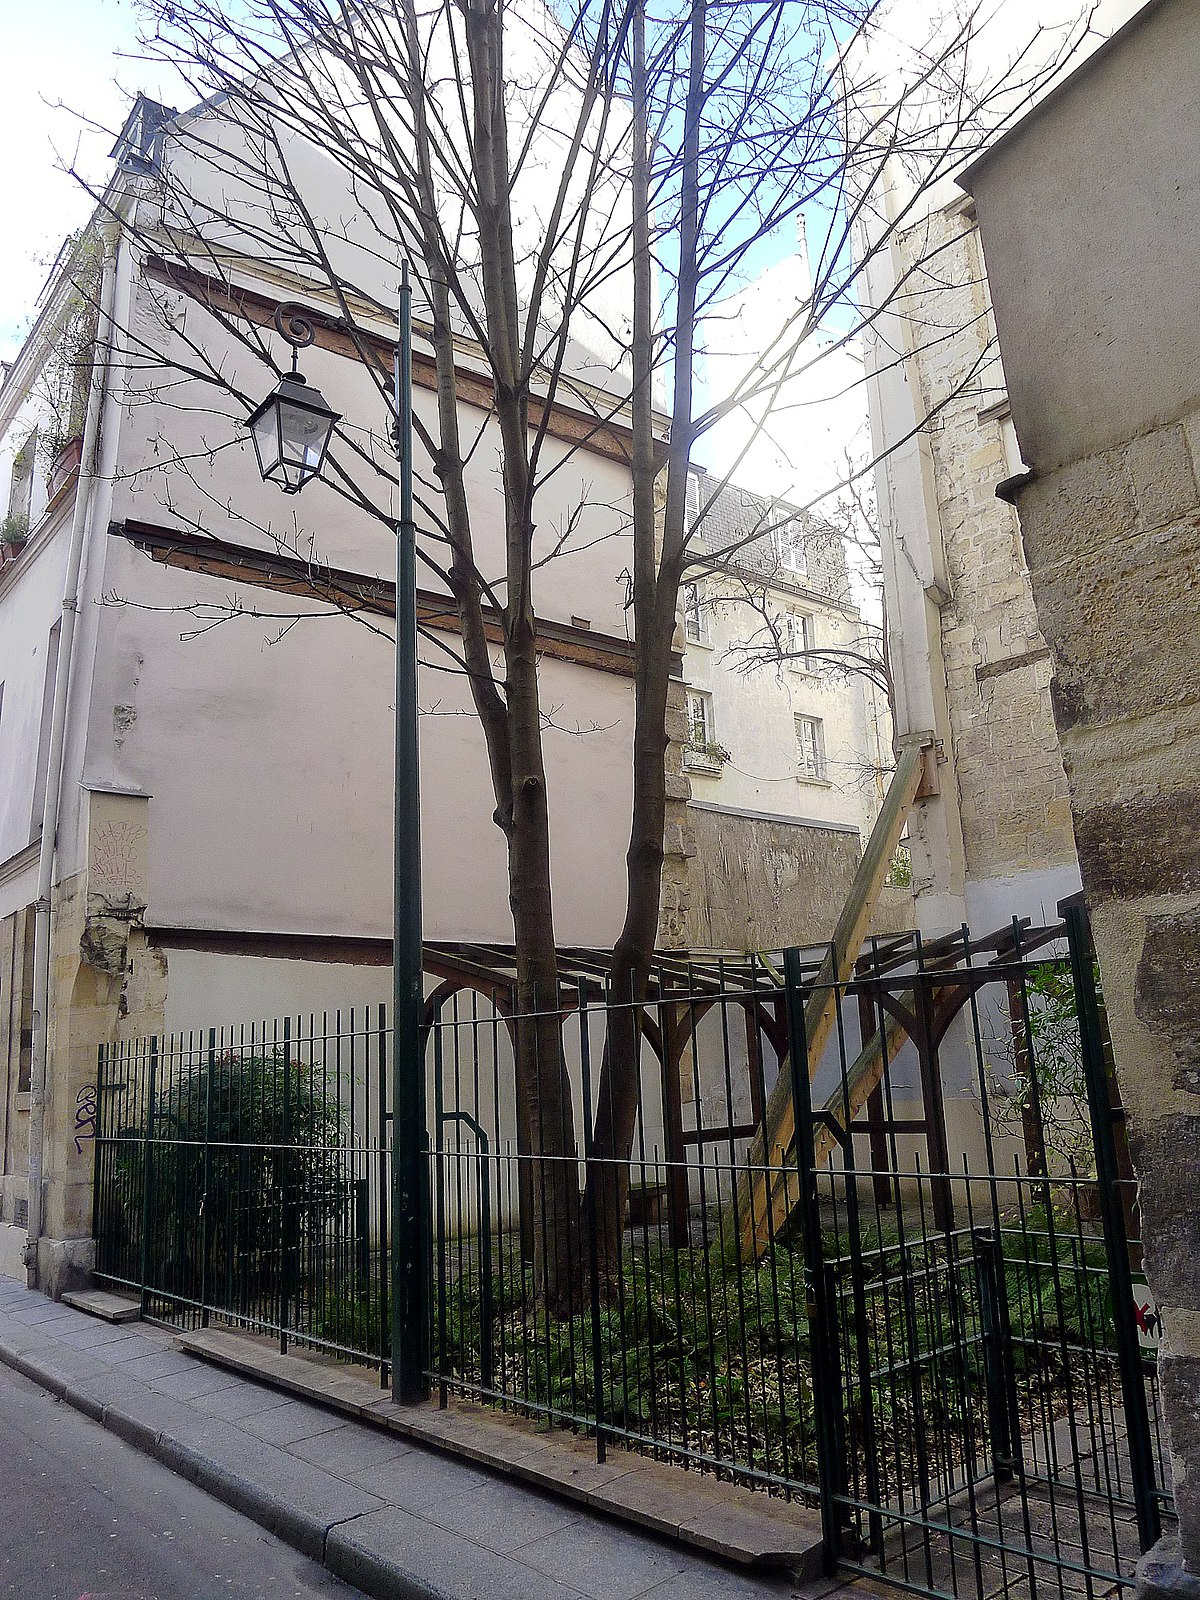 Parc de poche wikip dia - Petit jardin tijuana paris ...